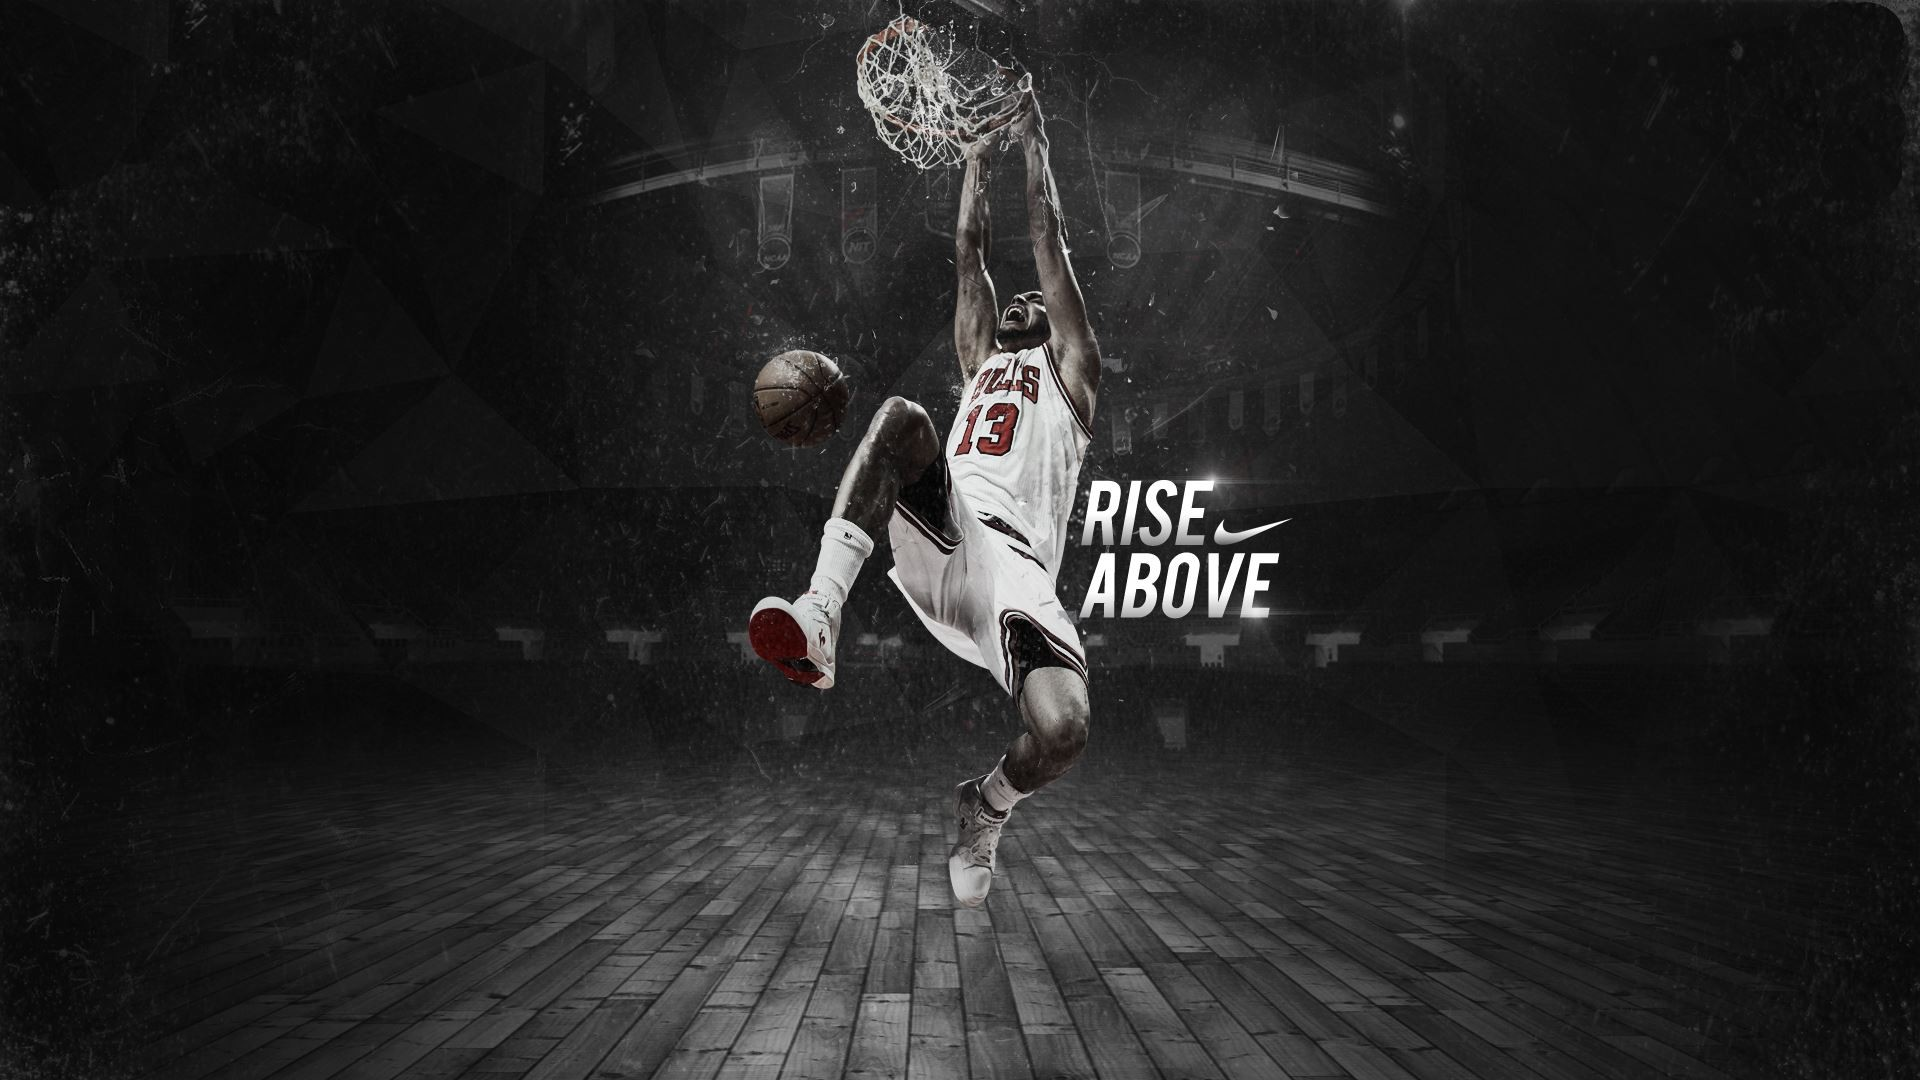 Nba Wallpaper Desktop Basketball Wallpapers 81 Images